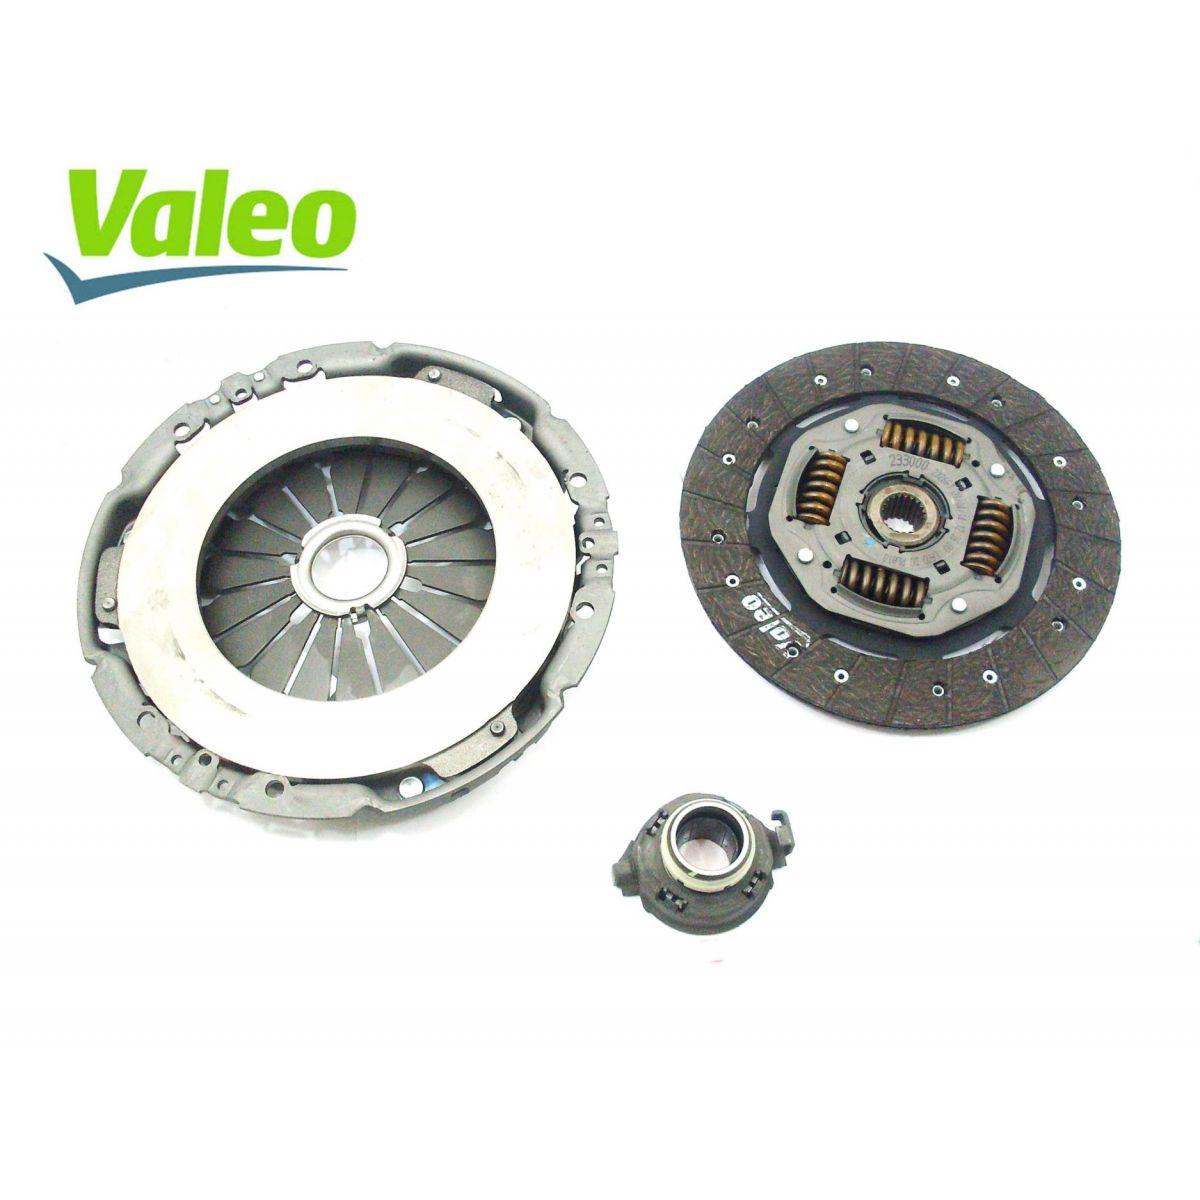 Kit Embreagem Ducato 2.3 Boxer 2.3 Jumper 2.3 Valeo